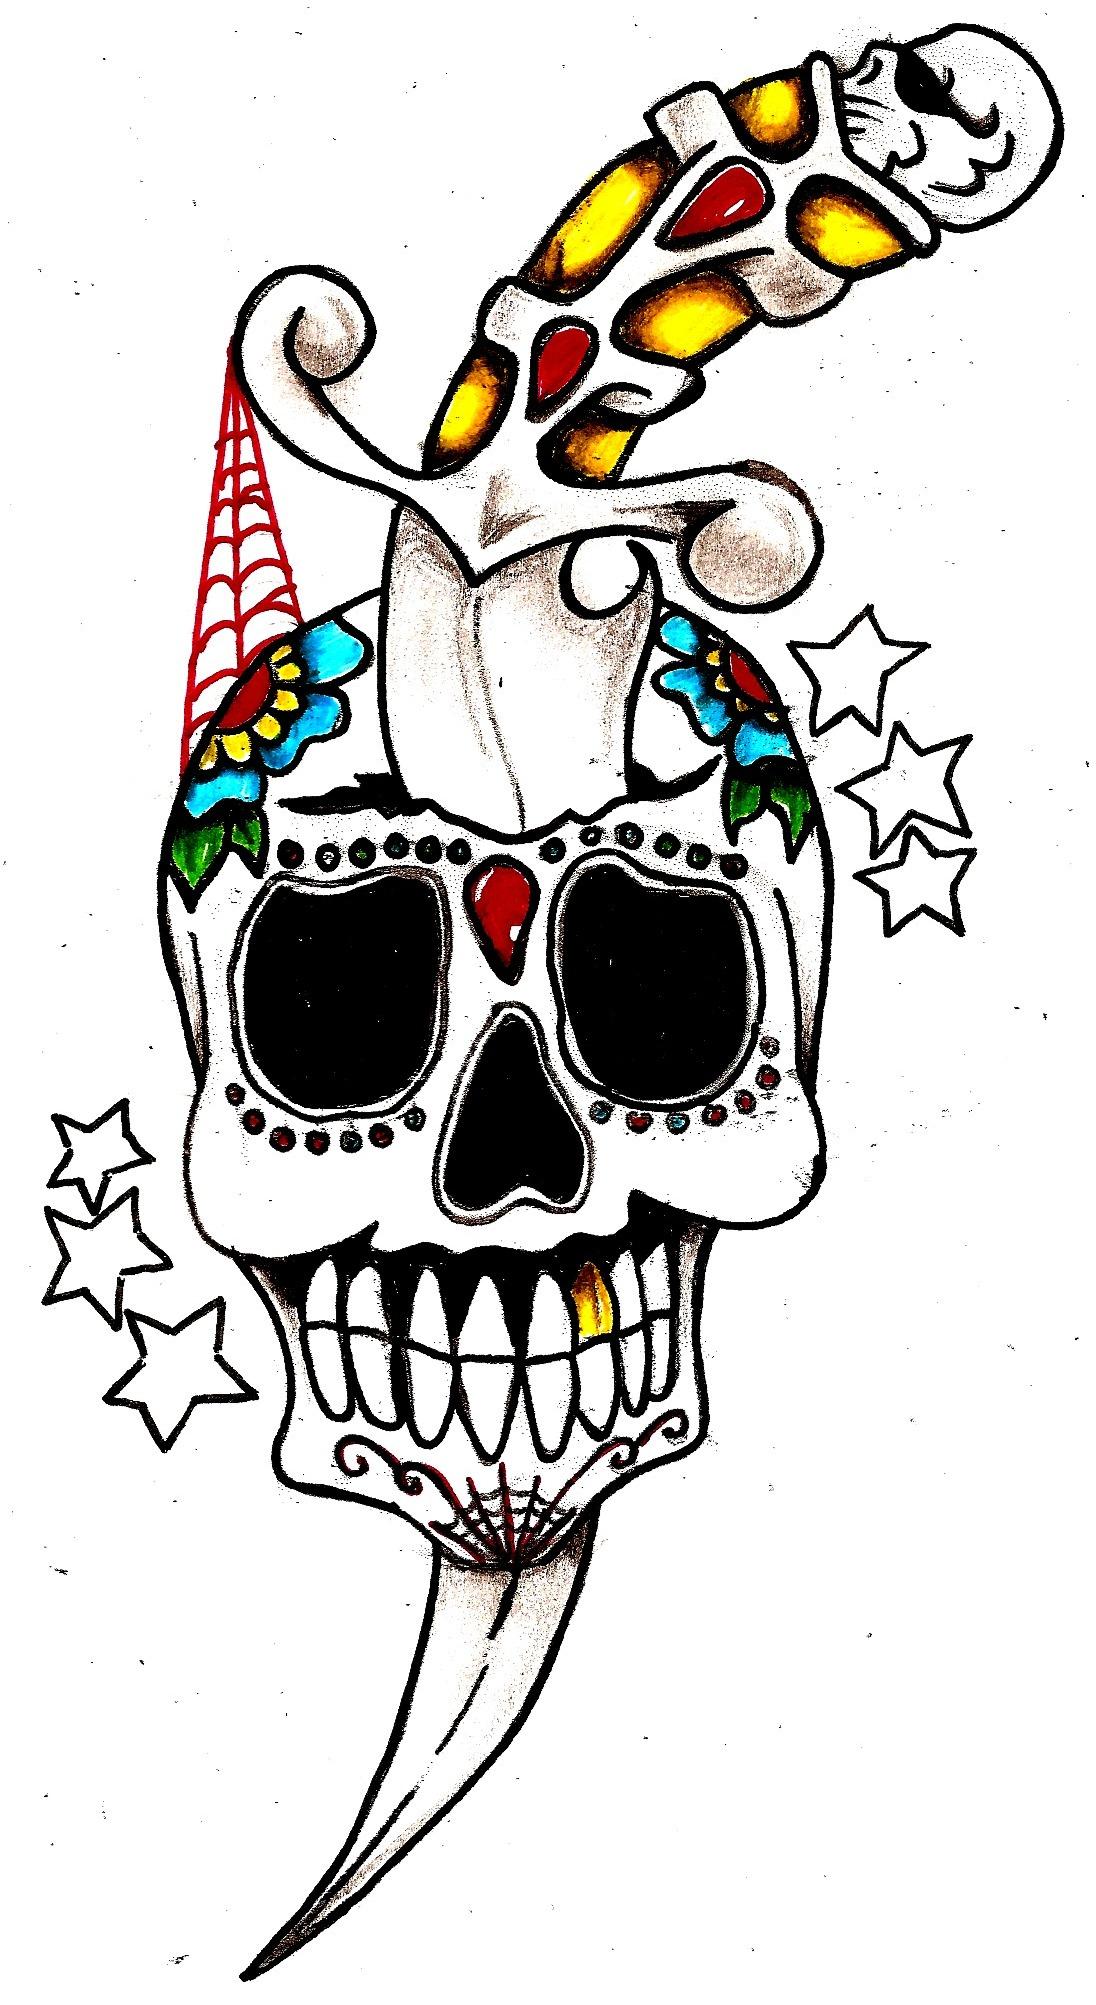 Tattoo Old School Pugnale Con Teschio Sfondi Hd Gratis